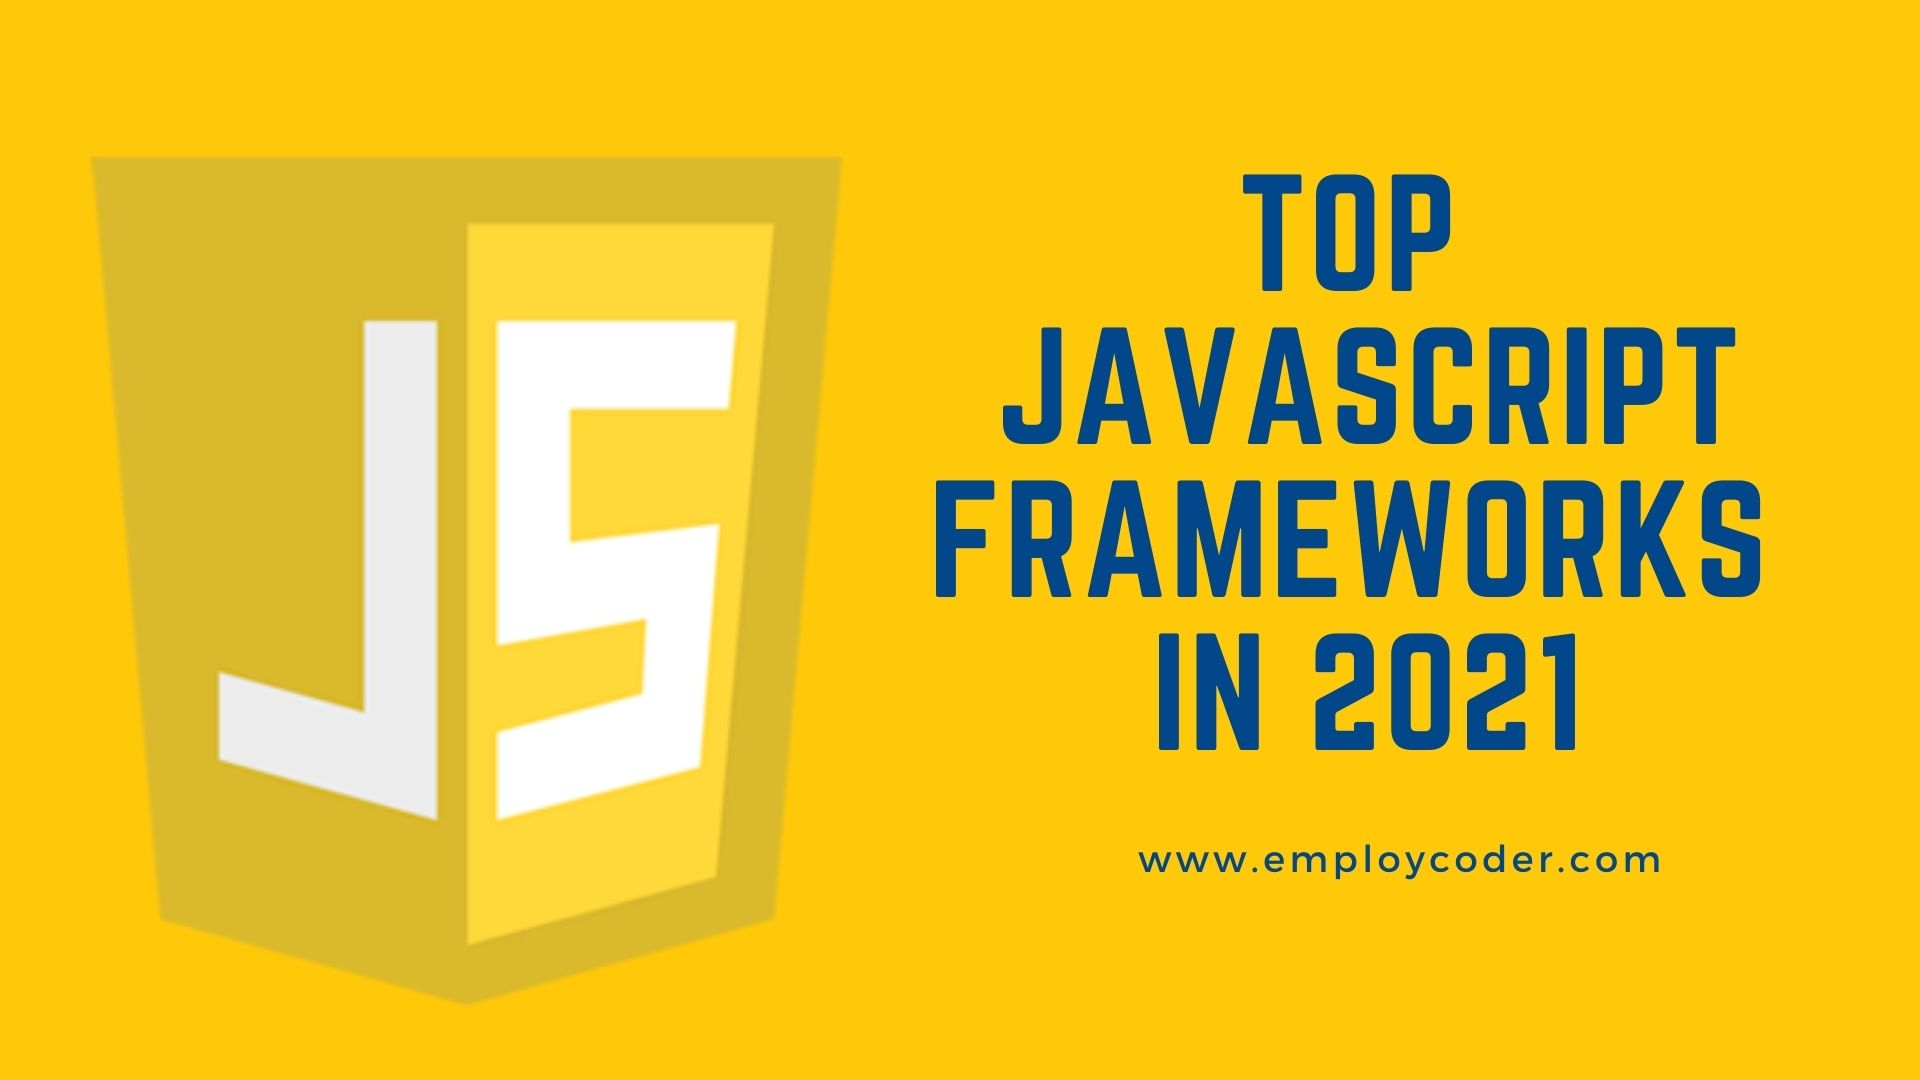 Top JavaScript Frameworks in 2021